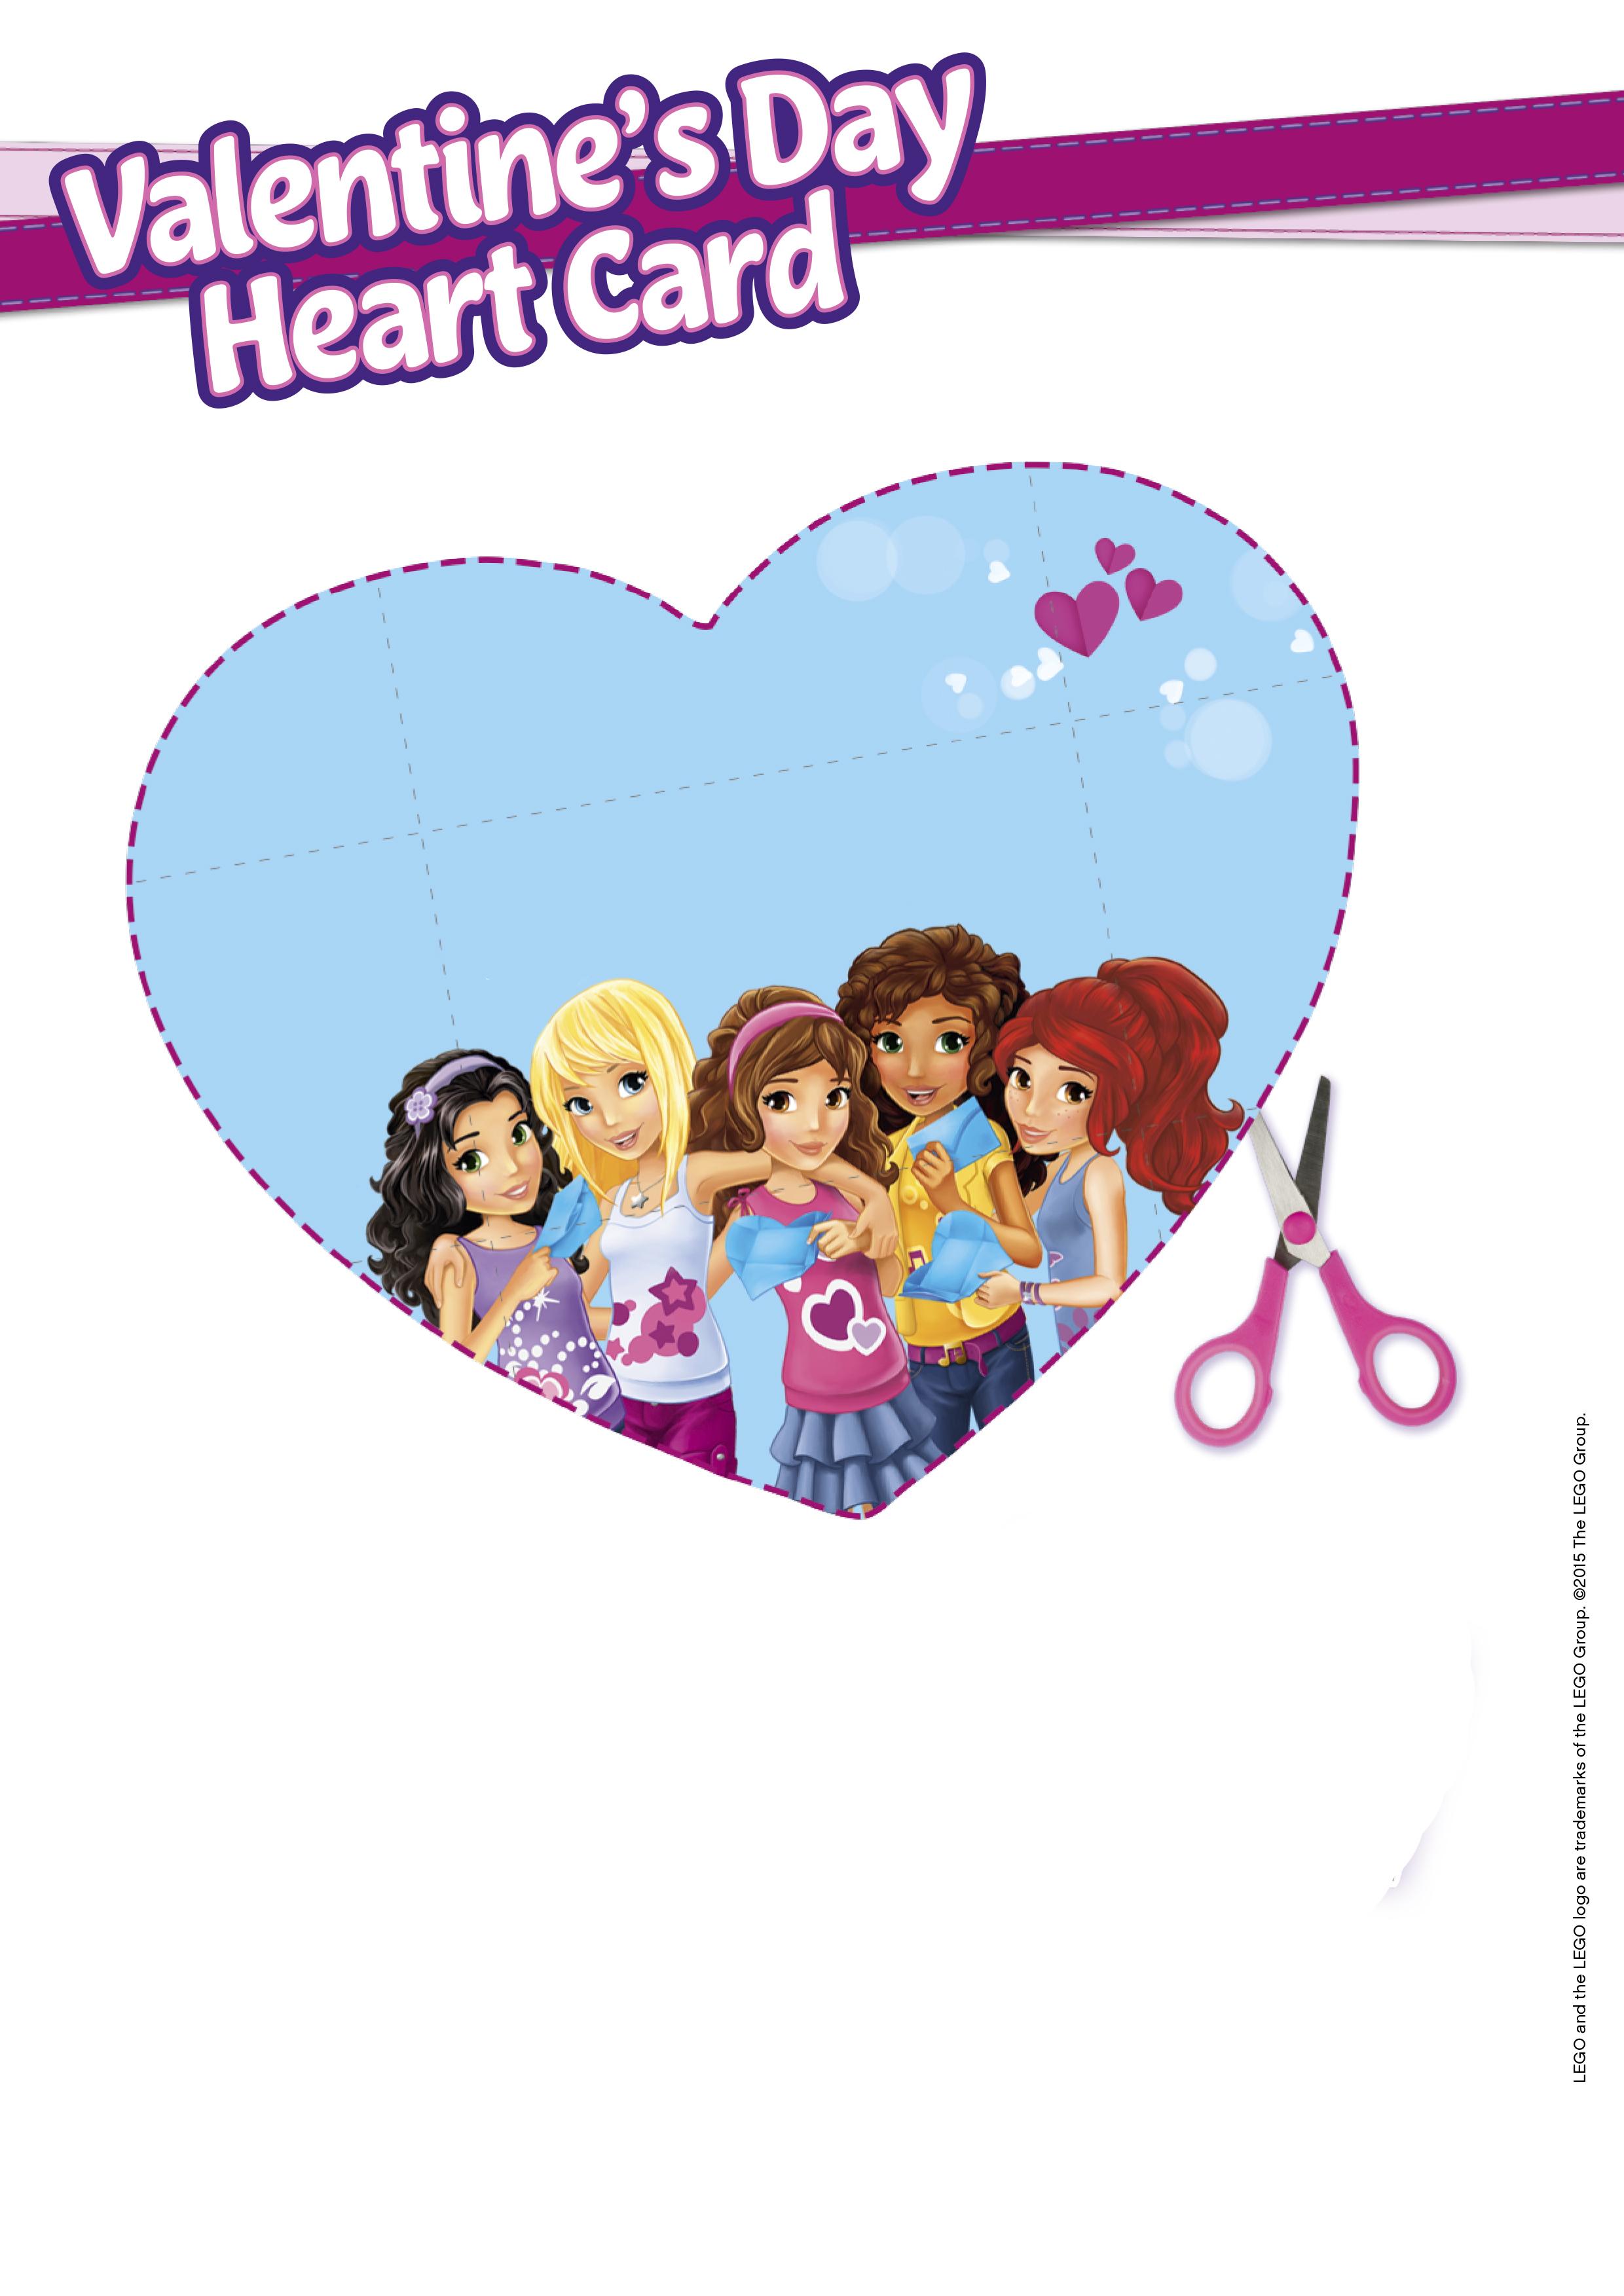 Картинки лего френдс для девочек - fab